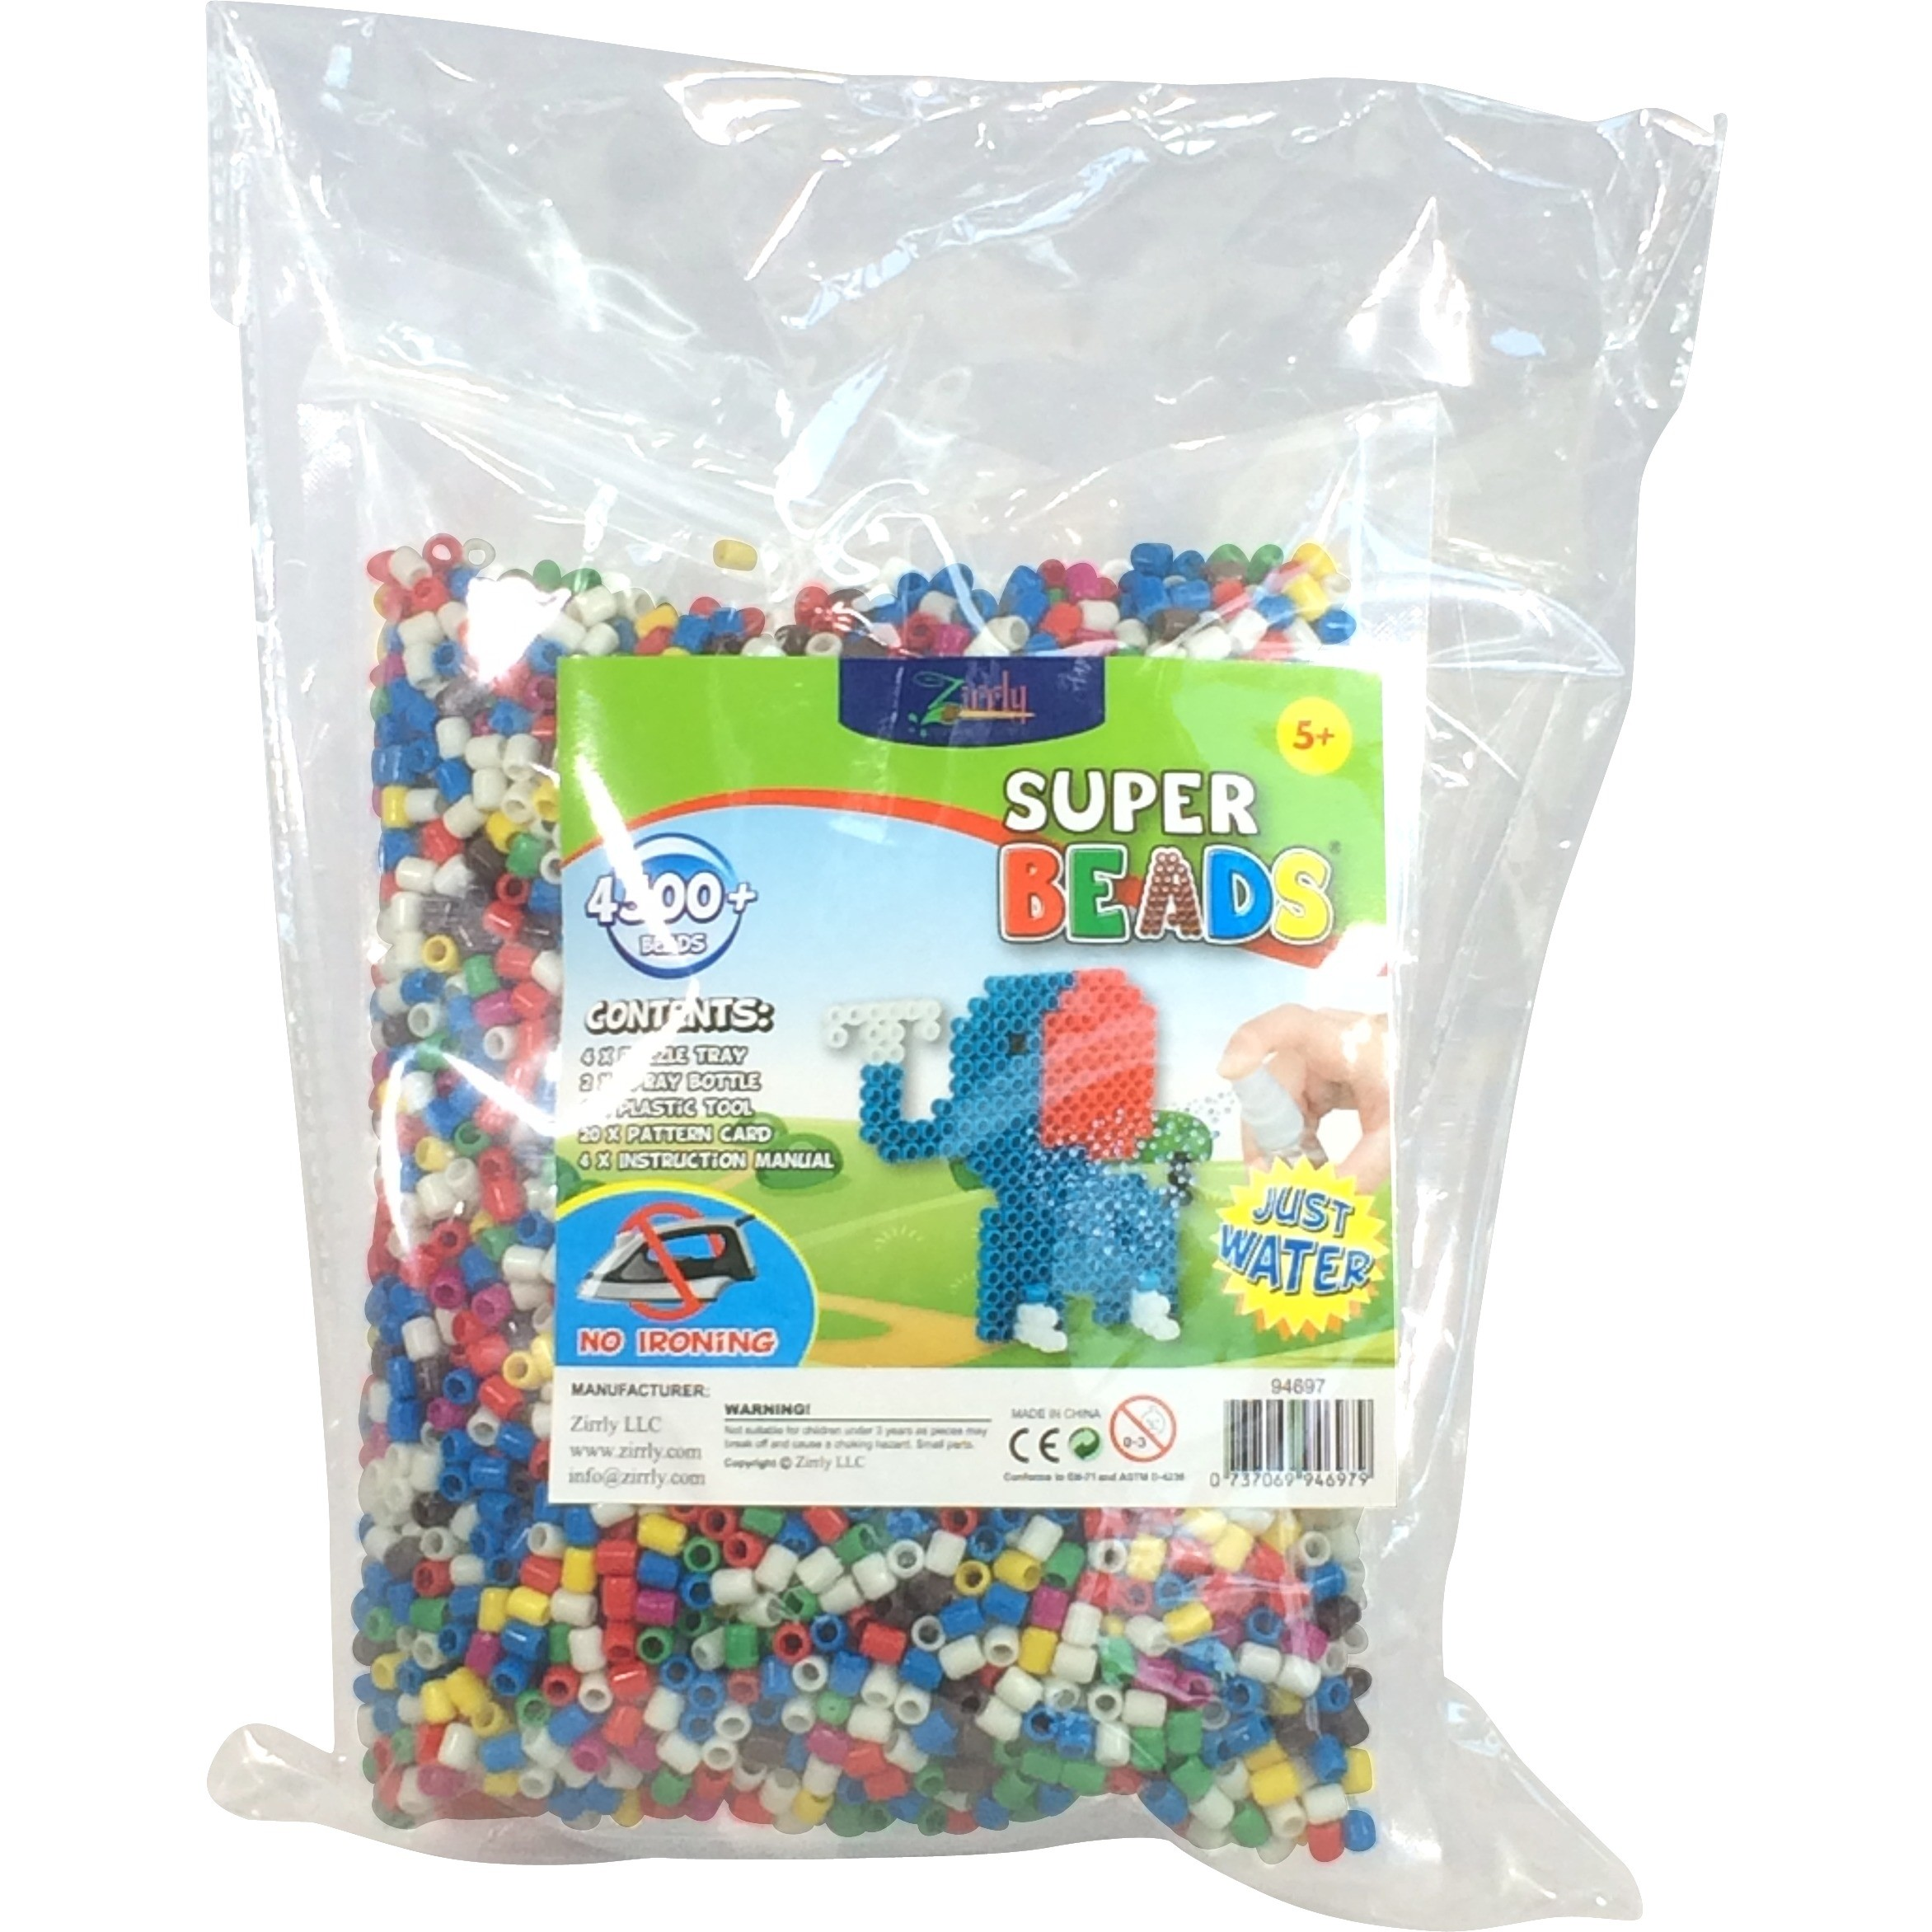 Super Beads Mega Pack